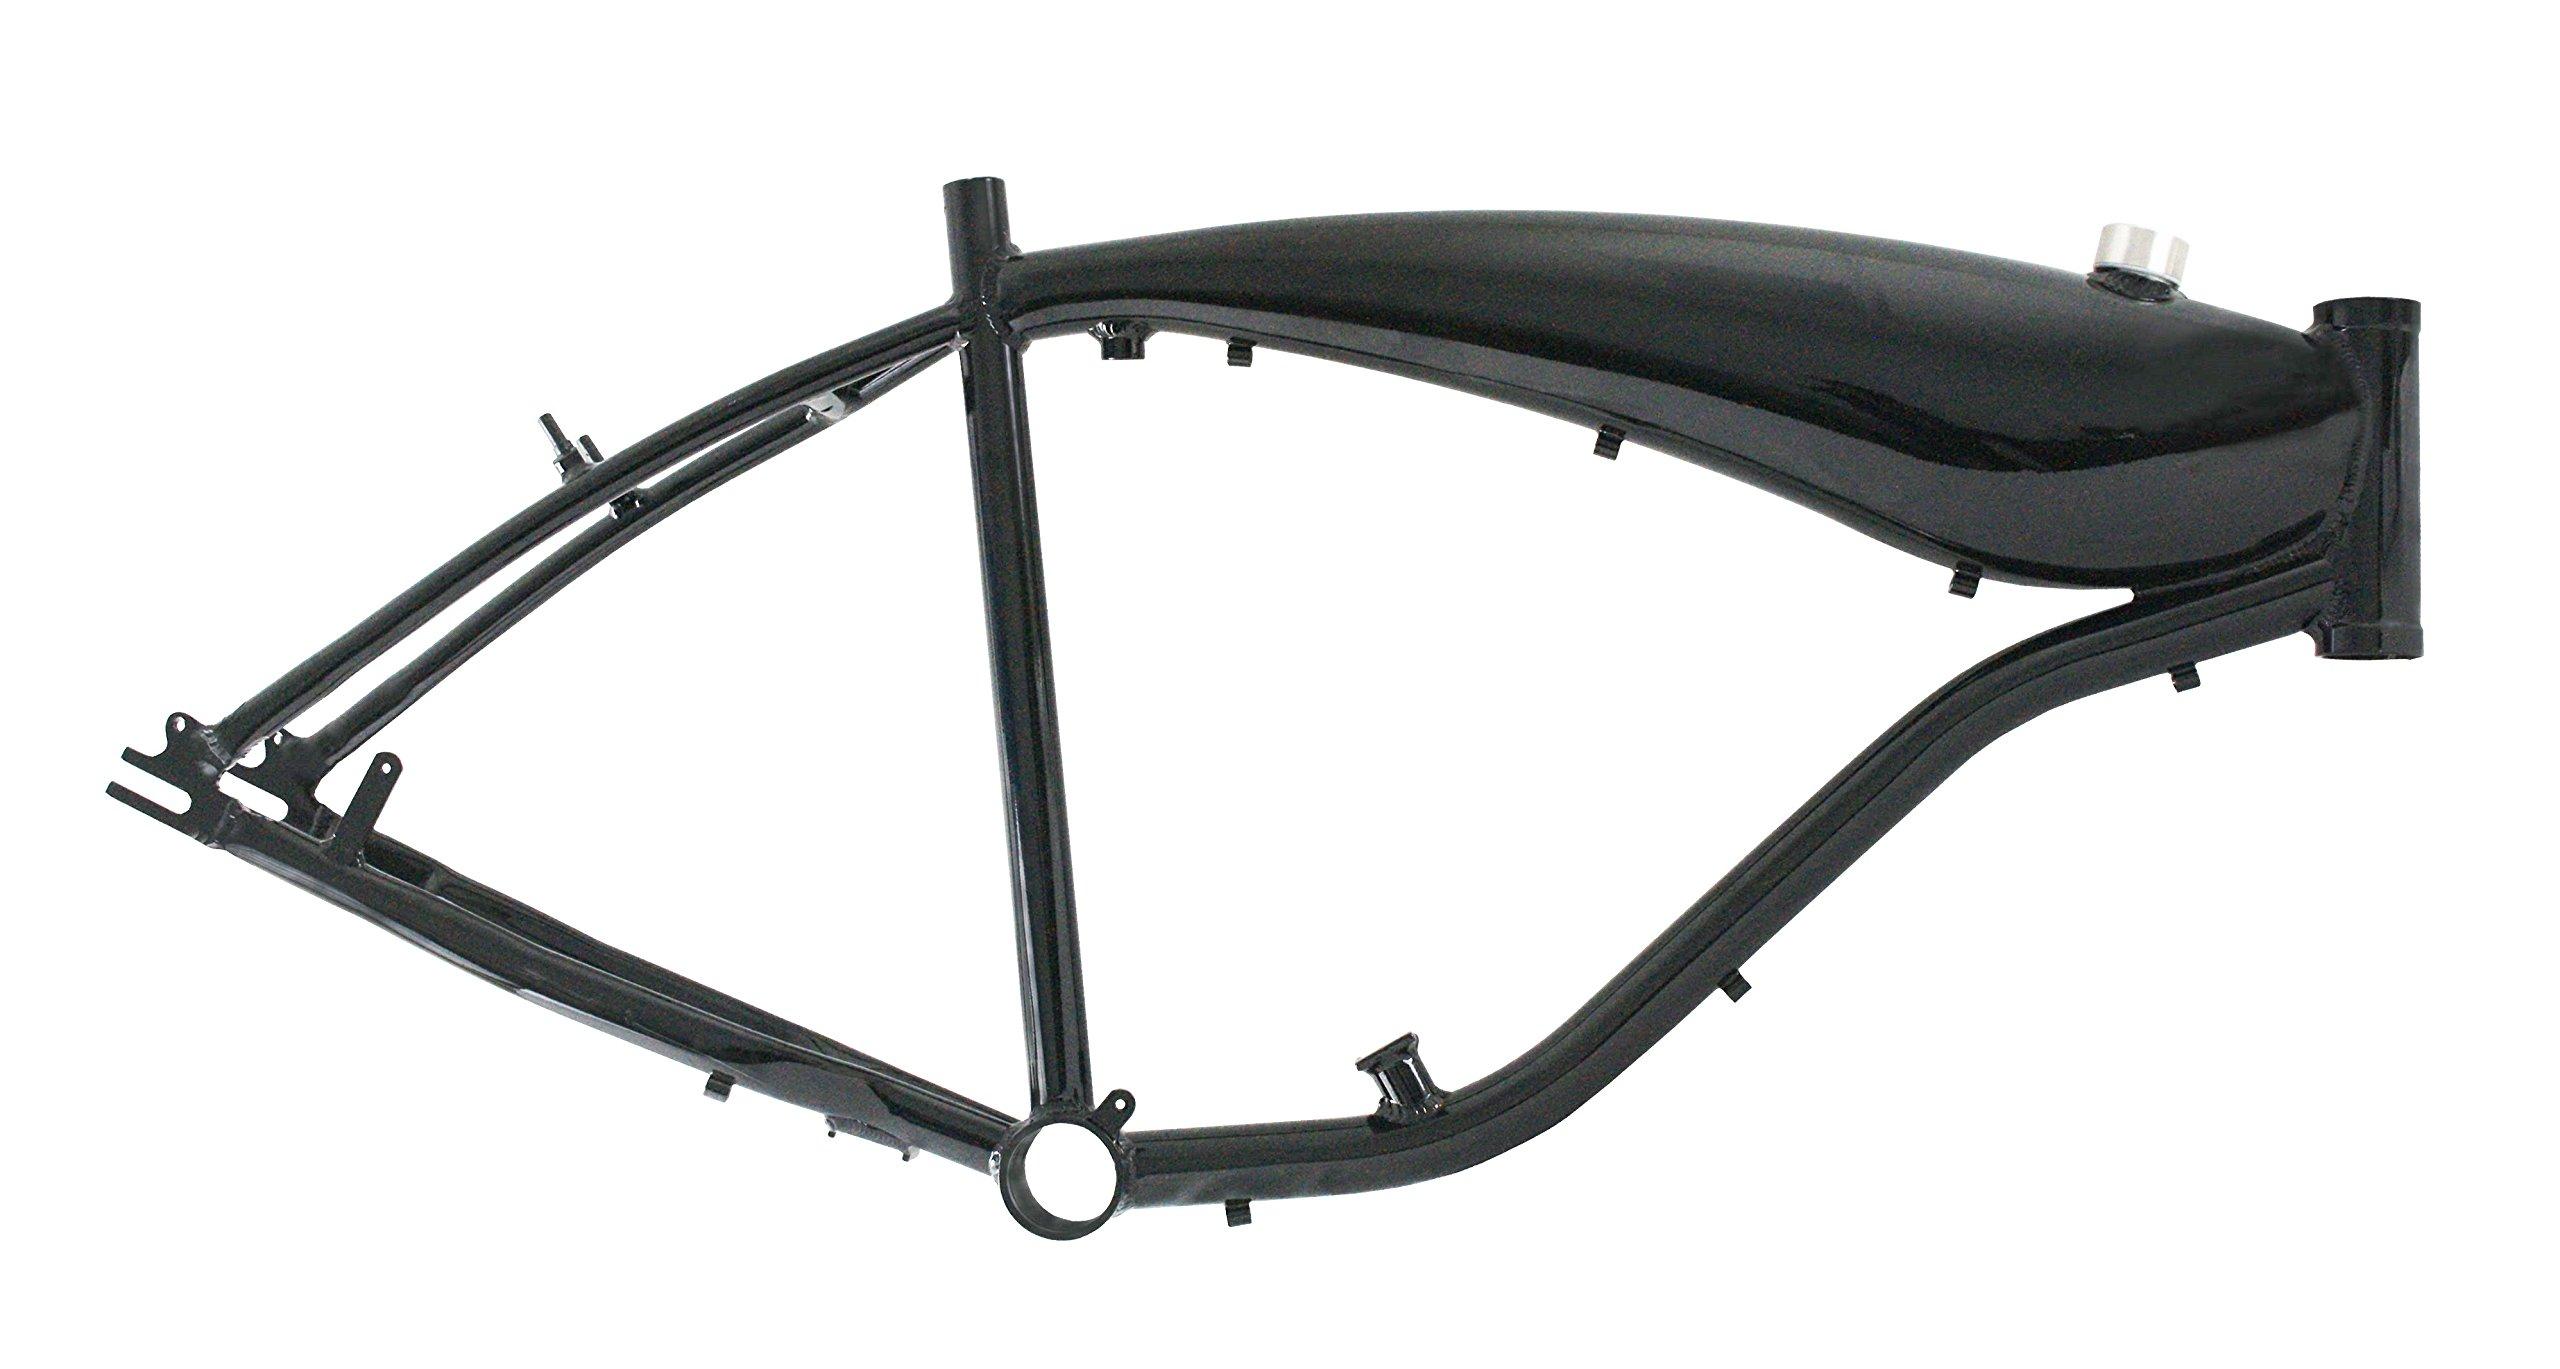 Bicycle Frame w/fuel tank 3.75l - Black